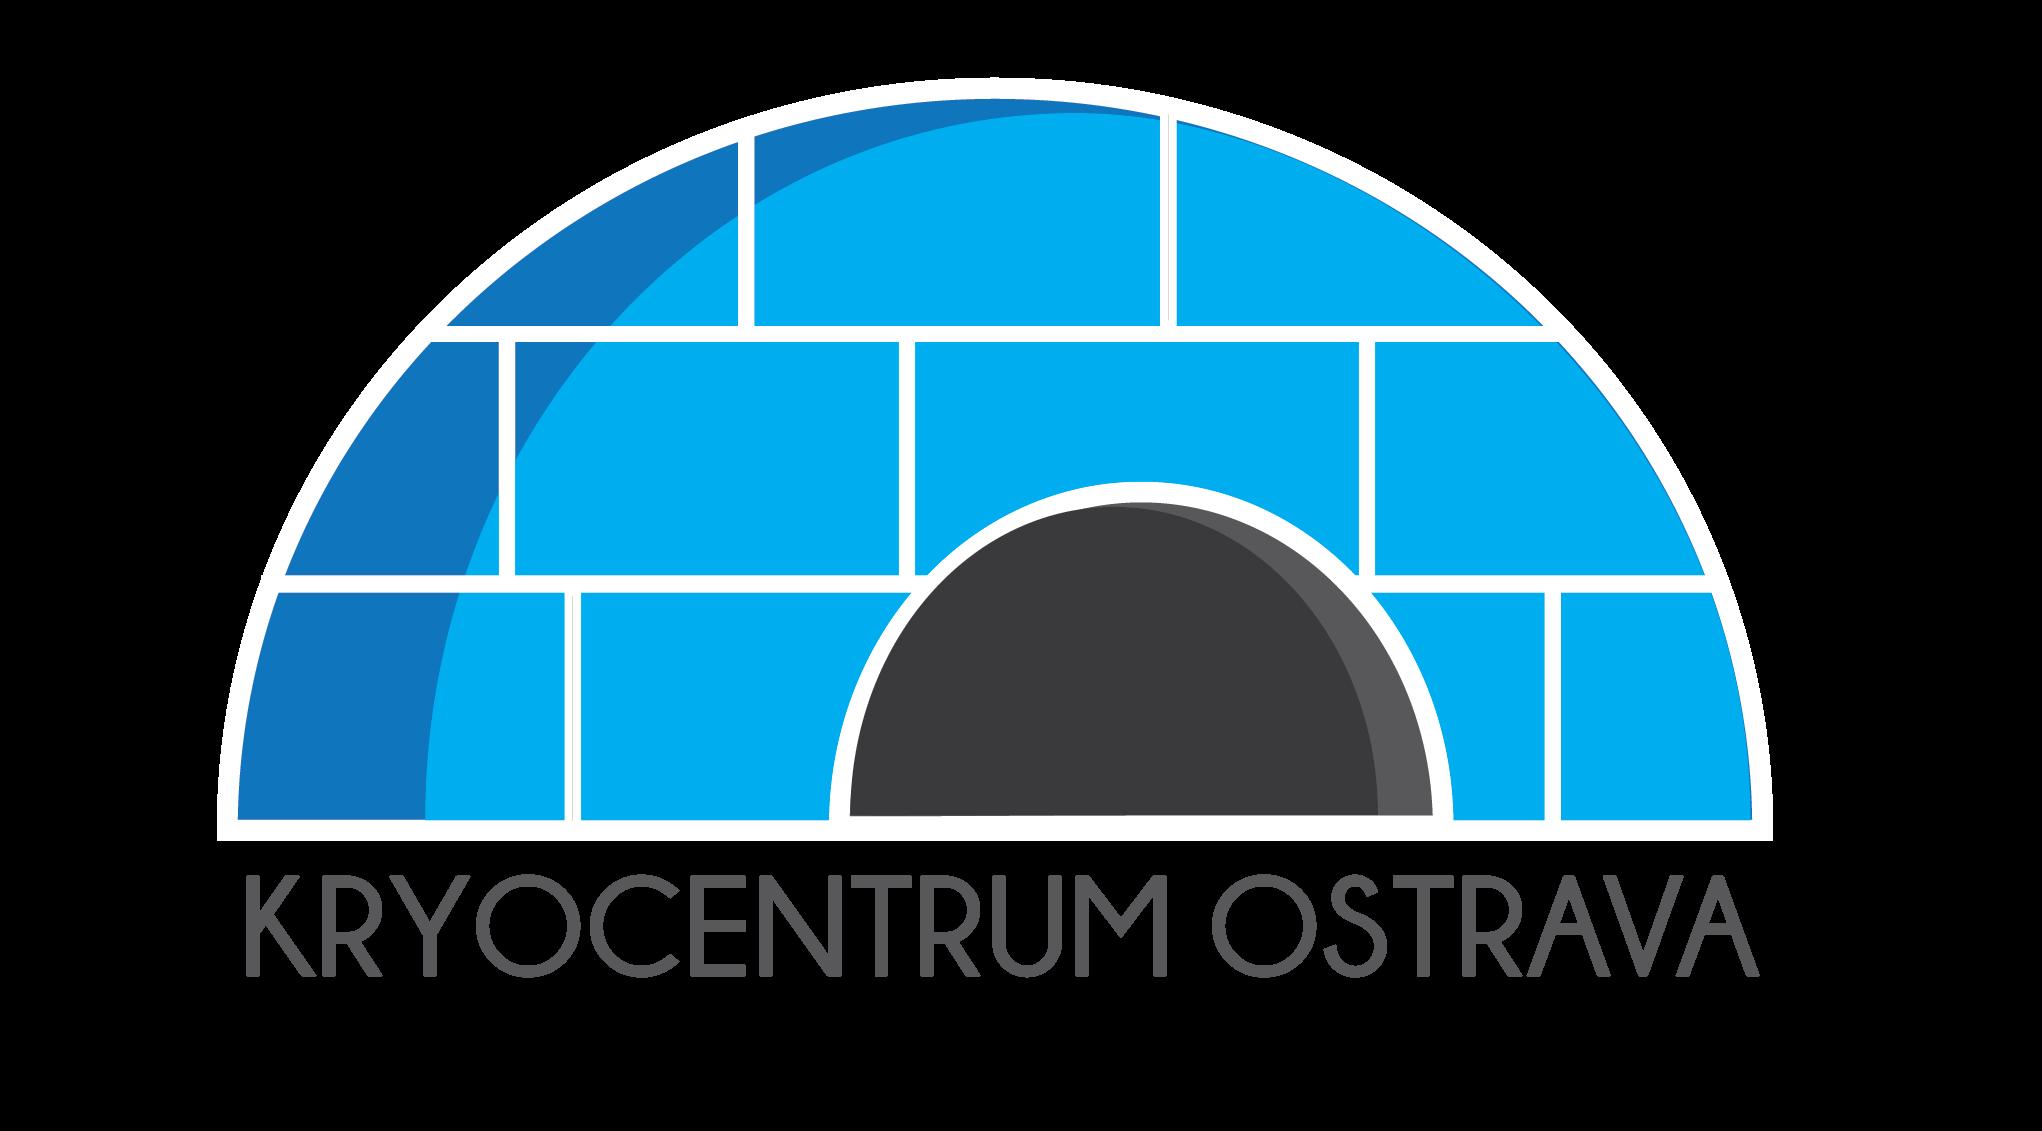 Kryocentrum ostrava logo